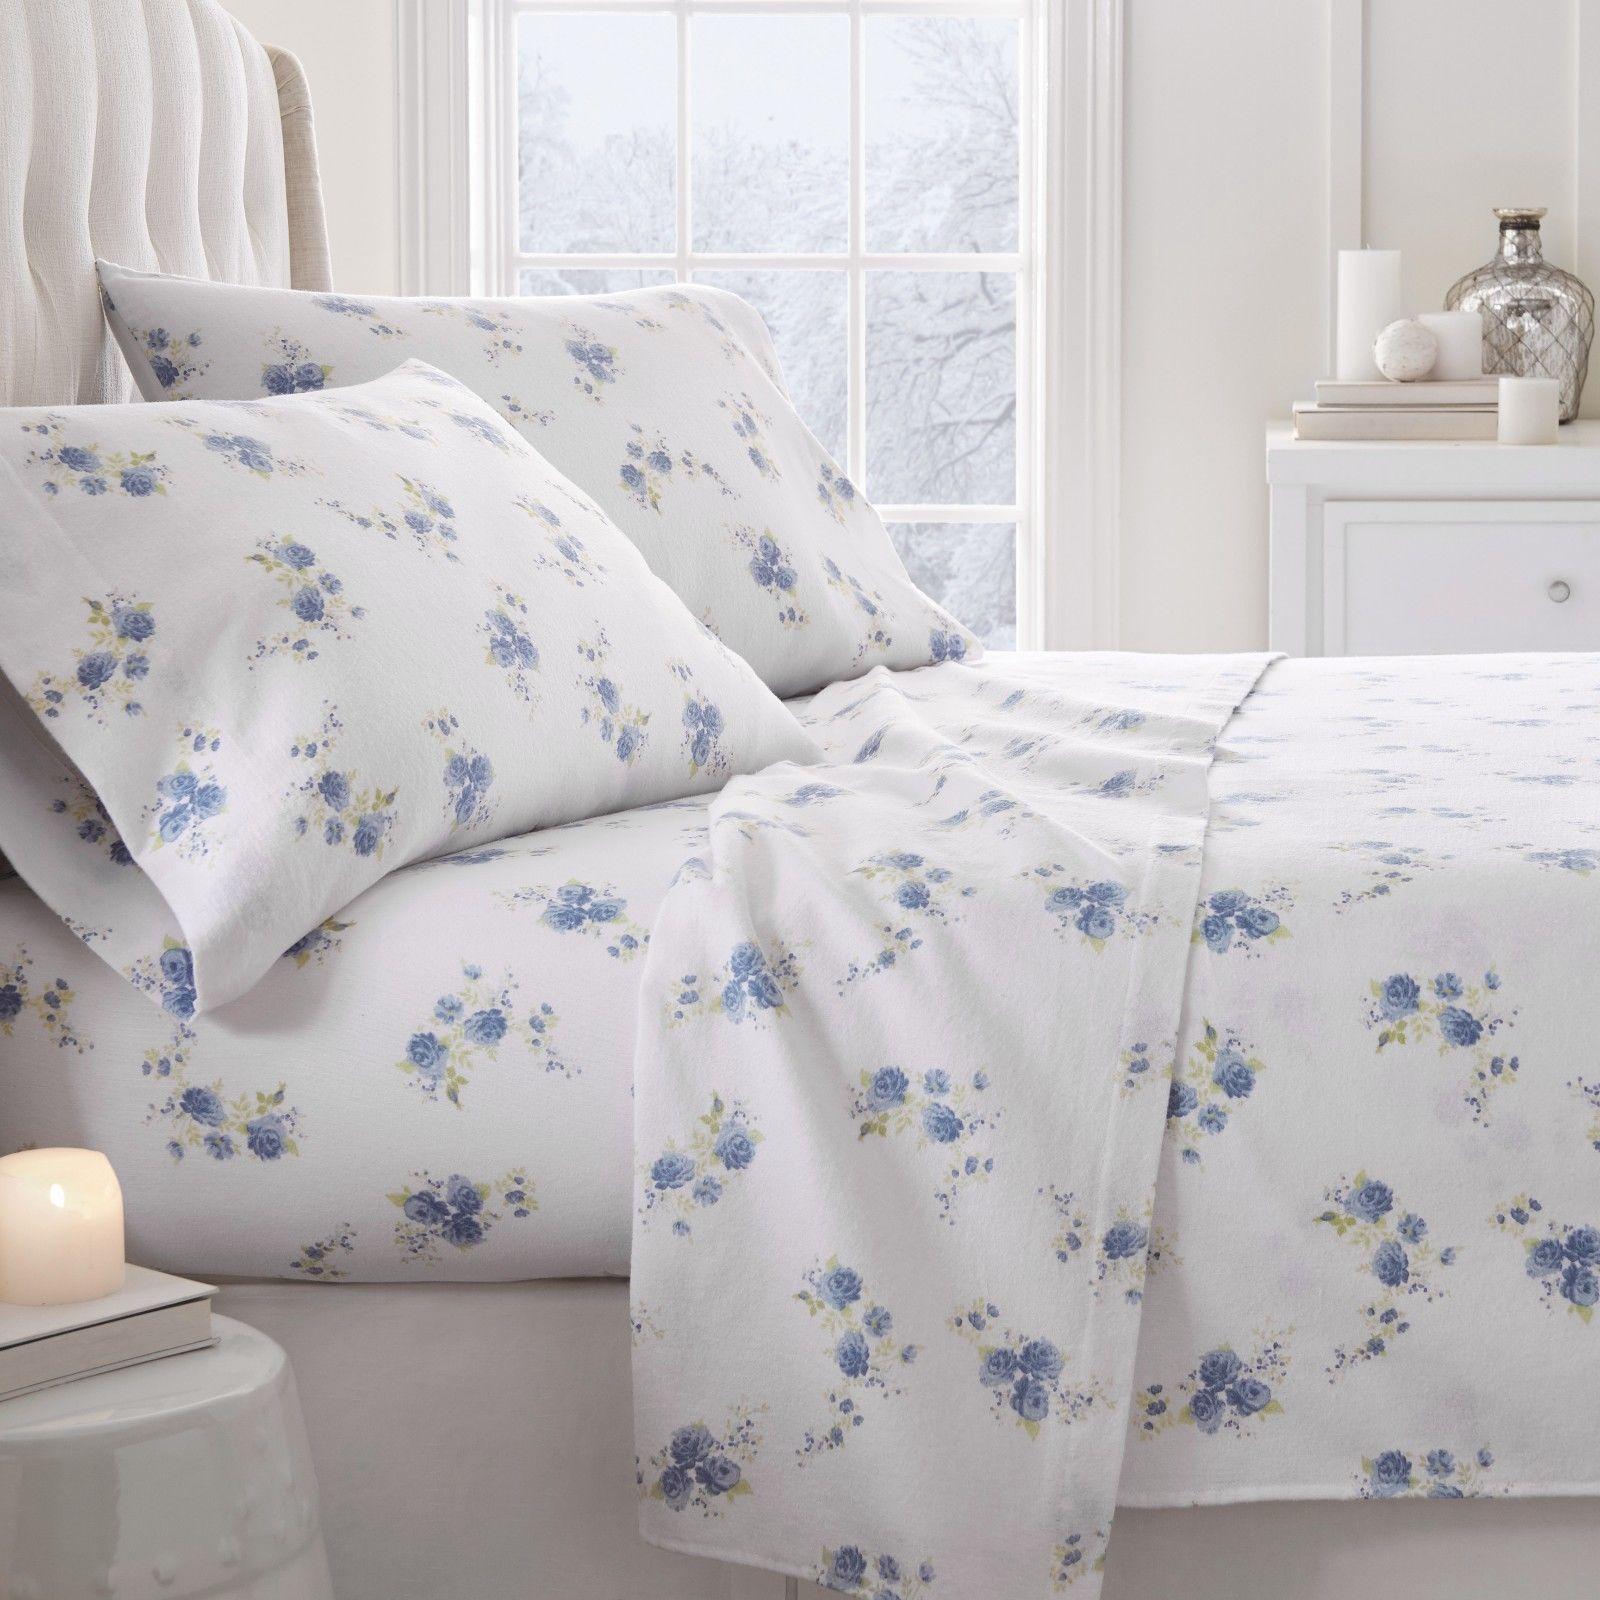 Ultra Soft Premium Rose Pattern 4 Piece Flannel Bed Sheet